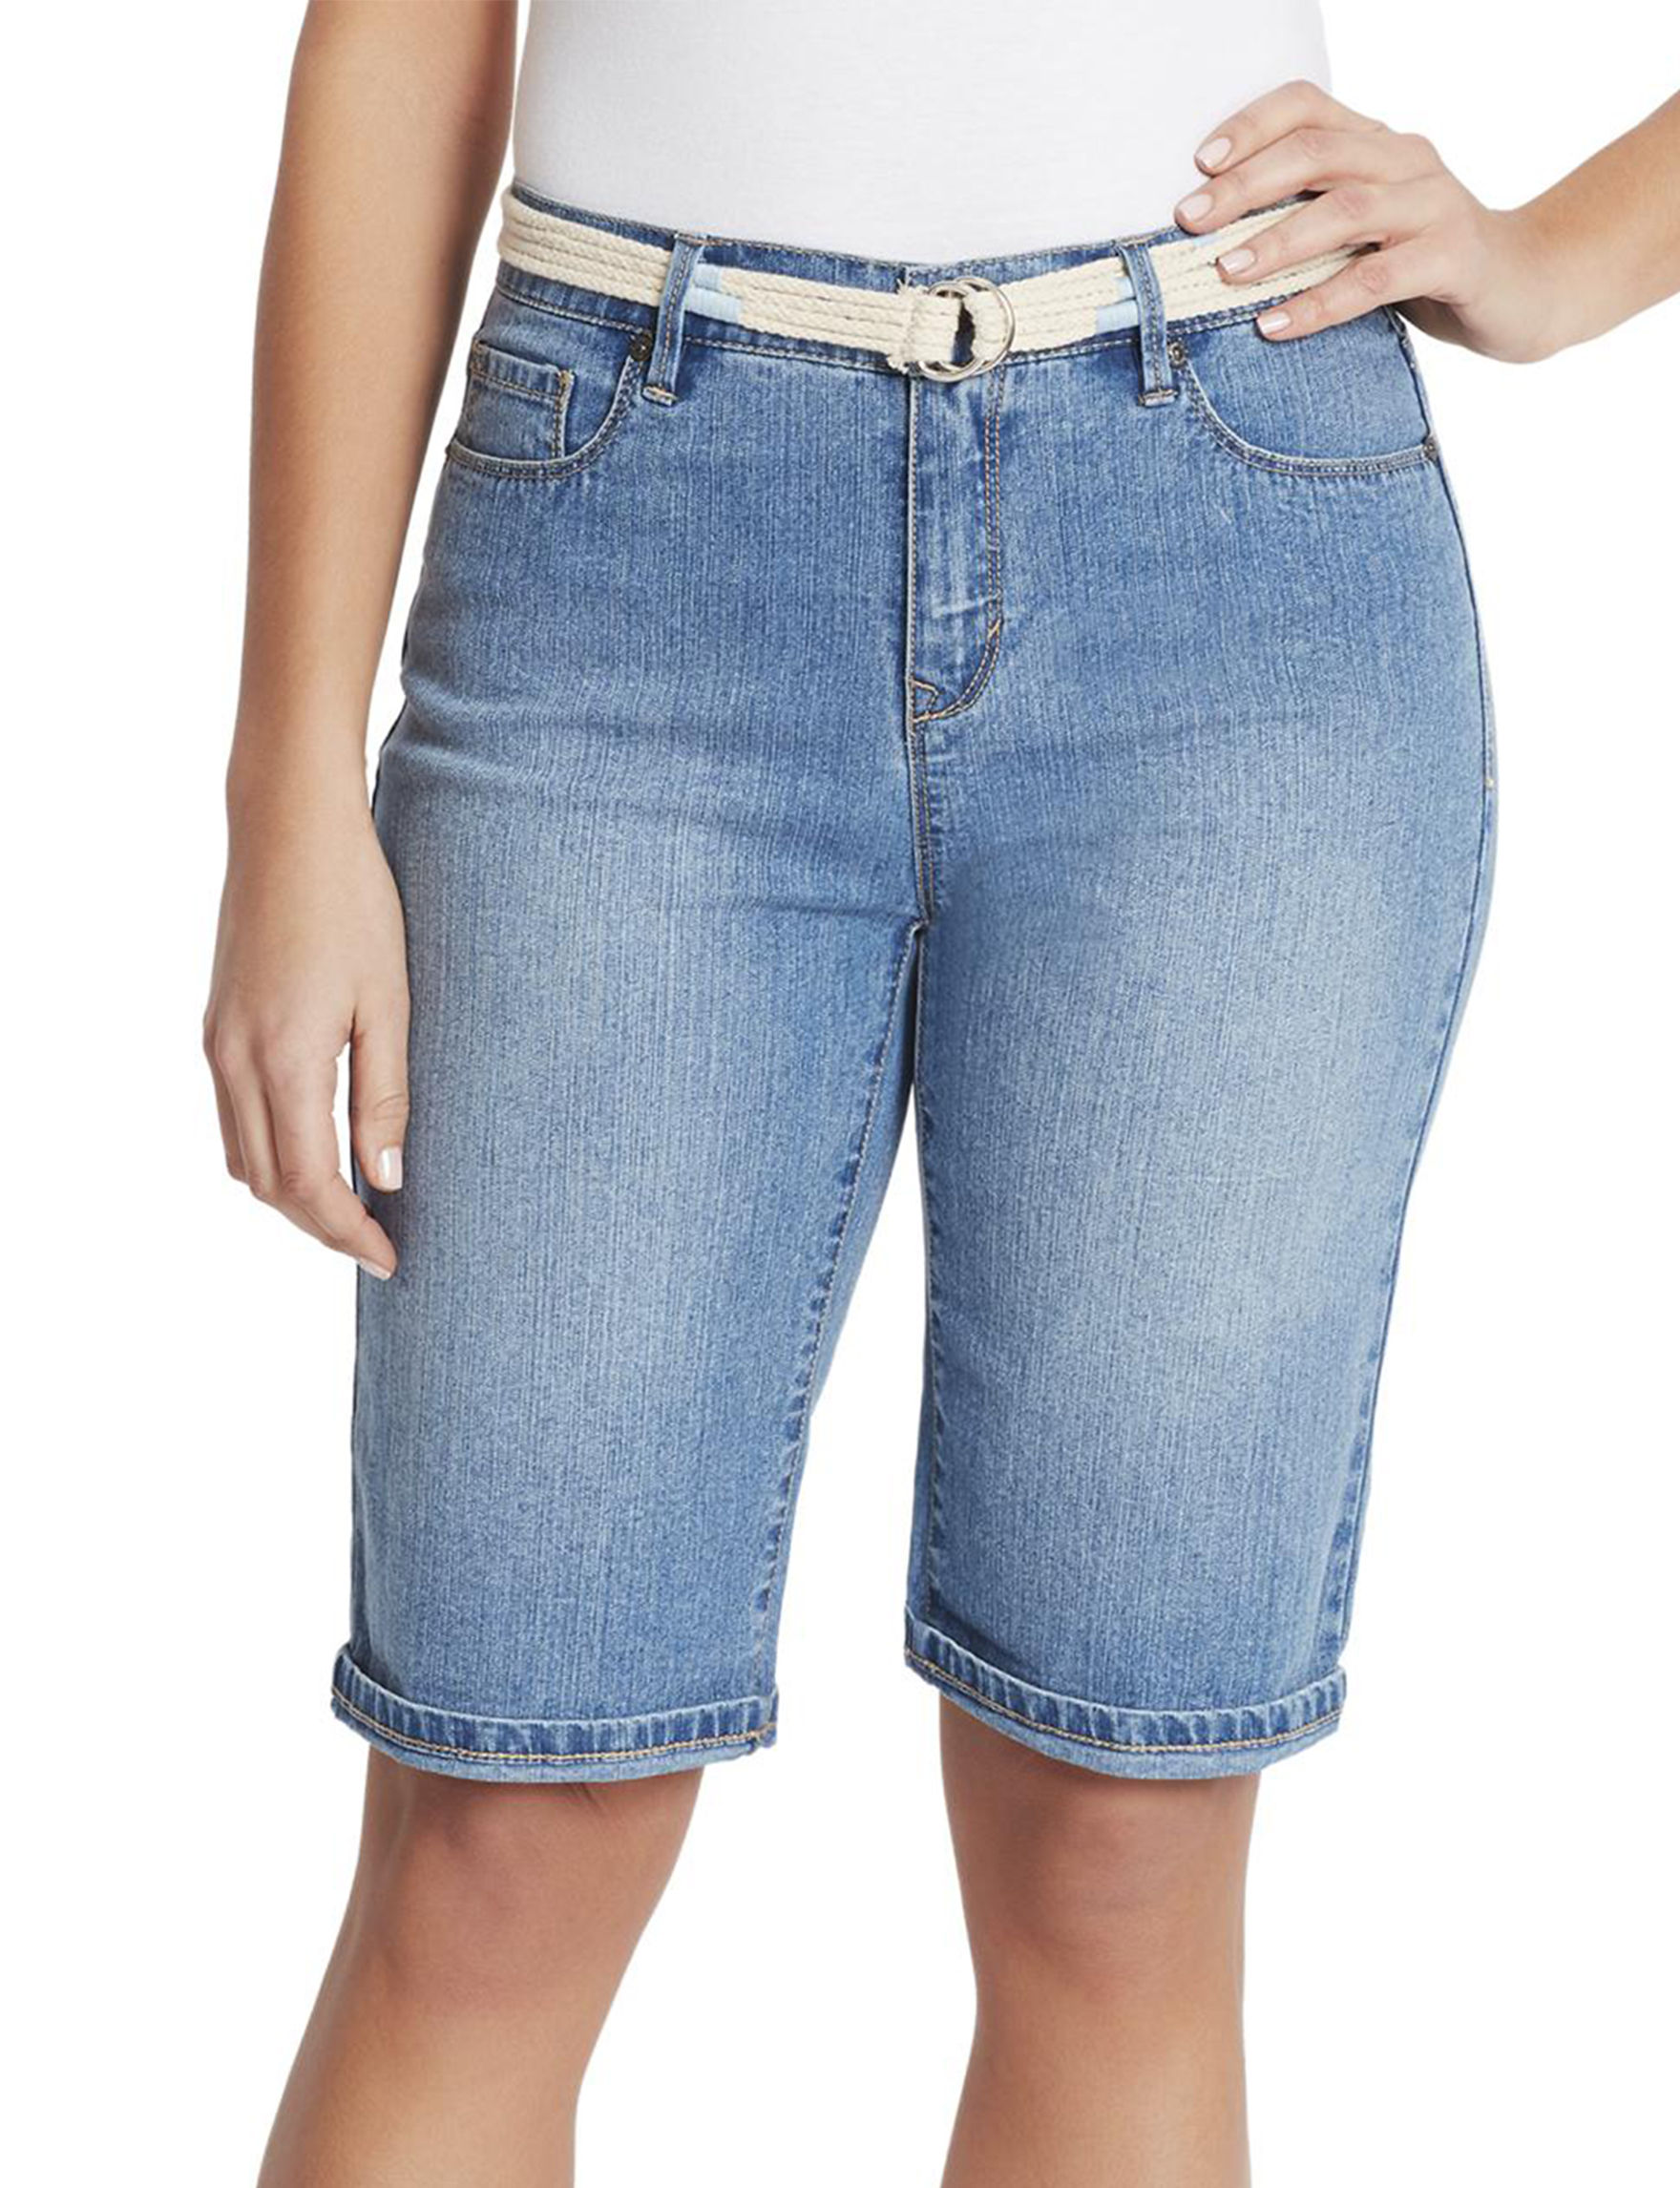 Gloria Vanderbilt Light Blue Bermudas Denim Shorts